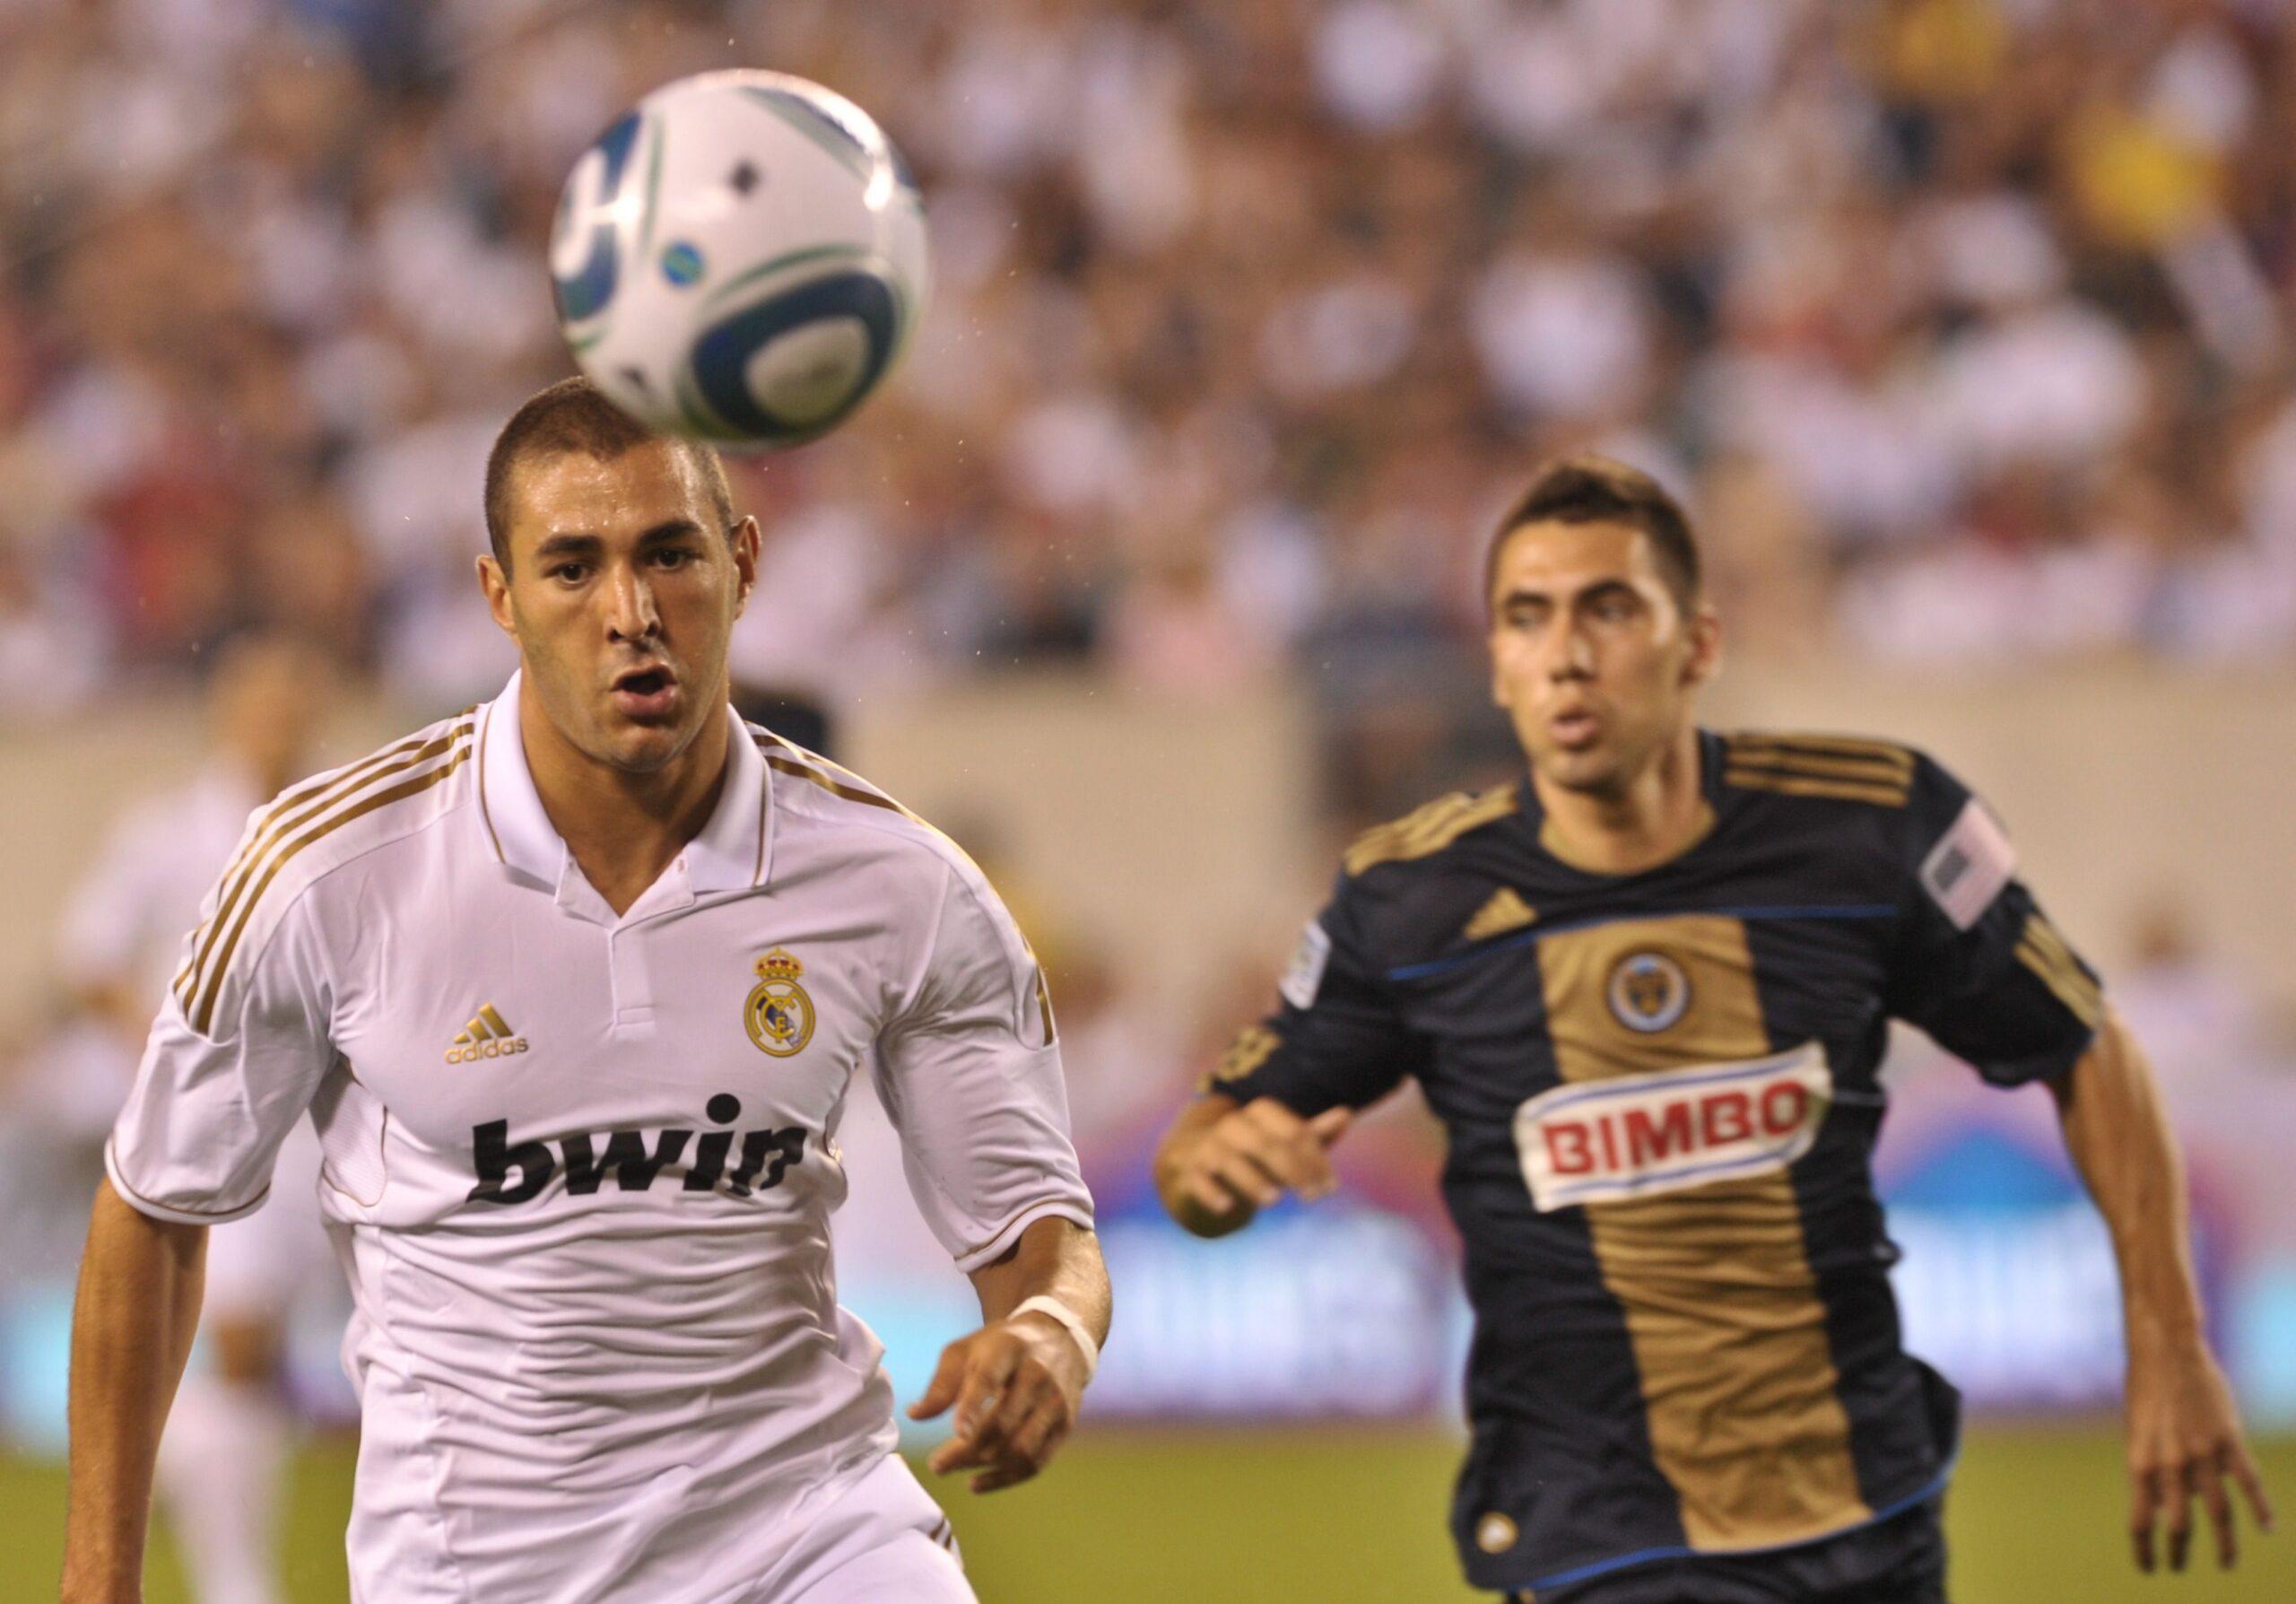 Pictures of Karim Benzema